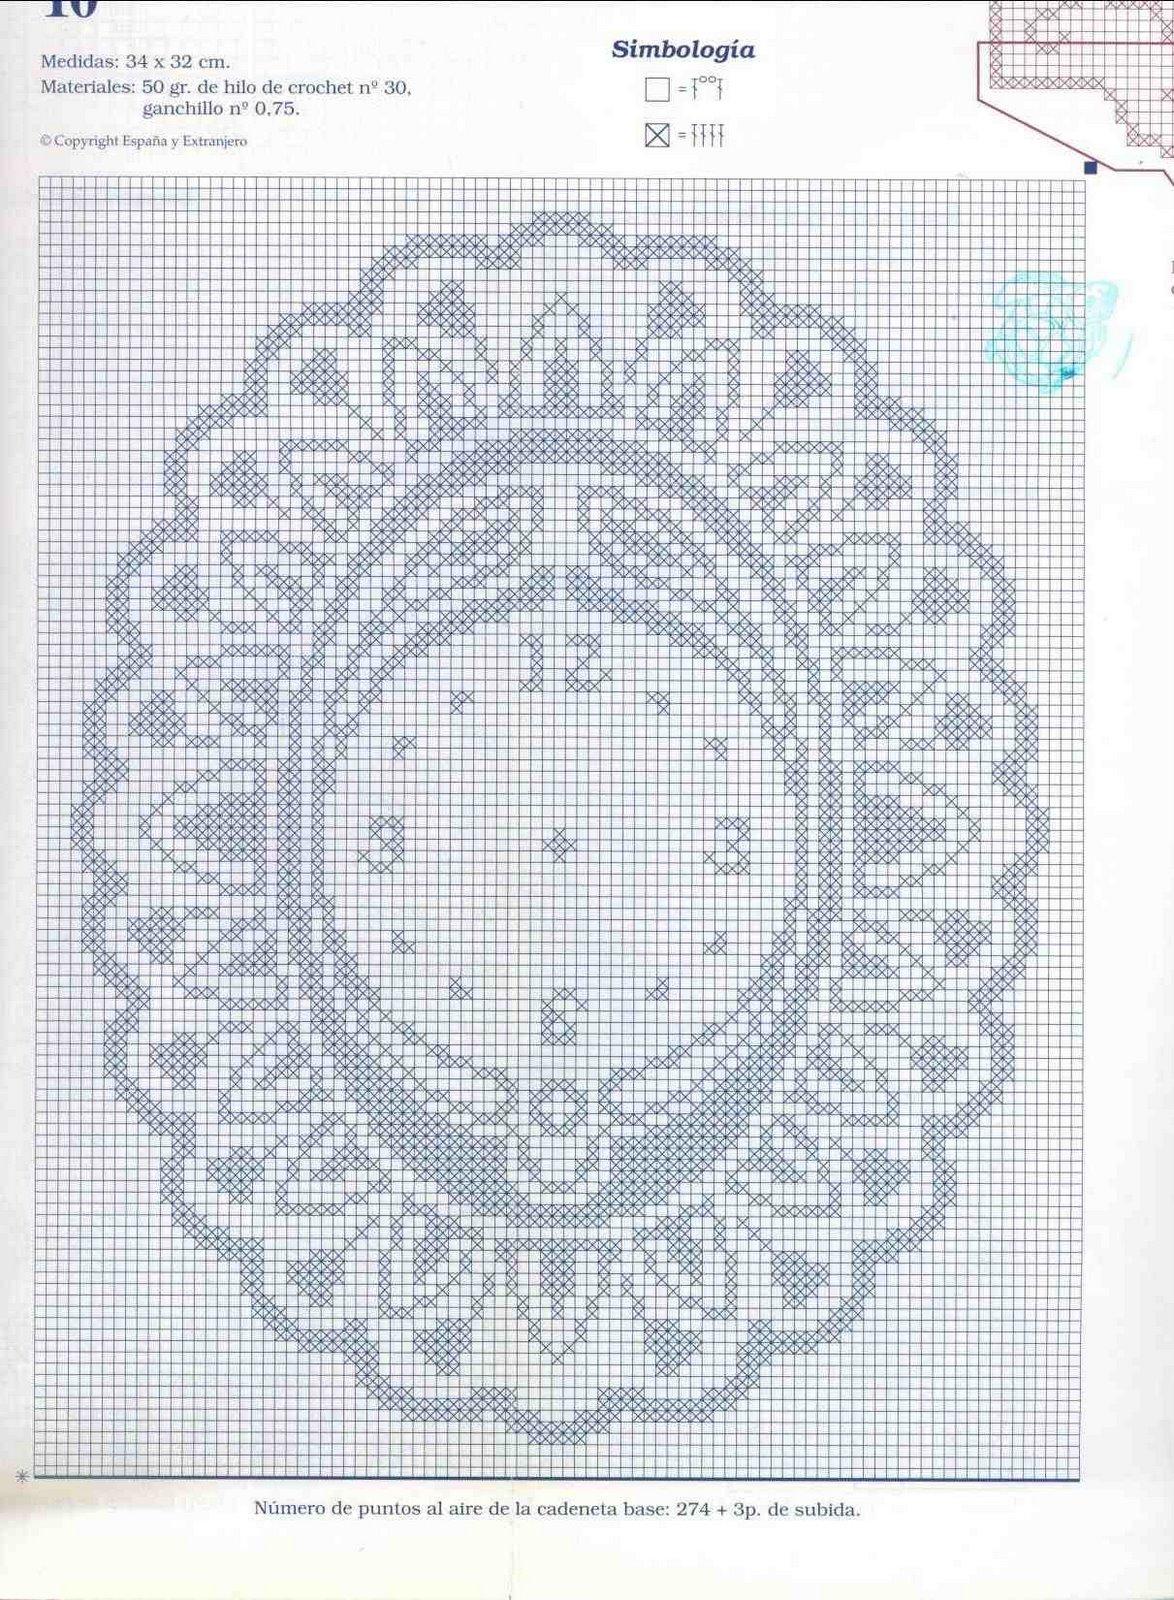 Orologio uncinetto filet 2 punto croce for Orologio punto croce schemi gratis